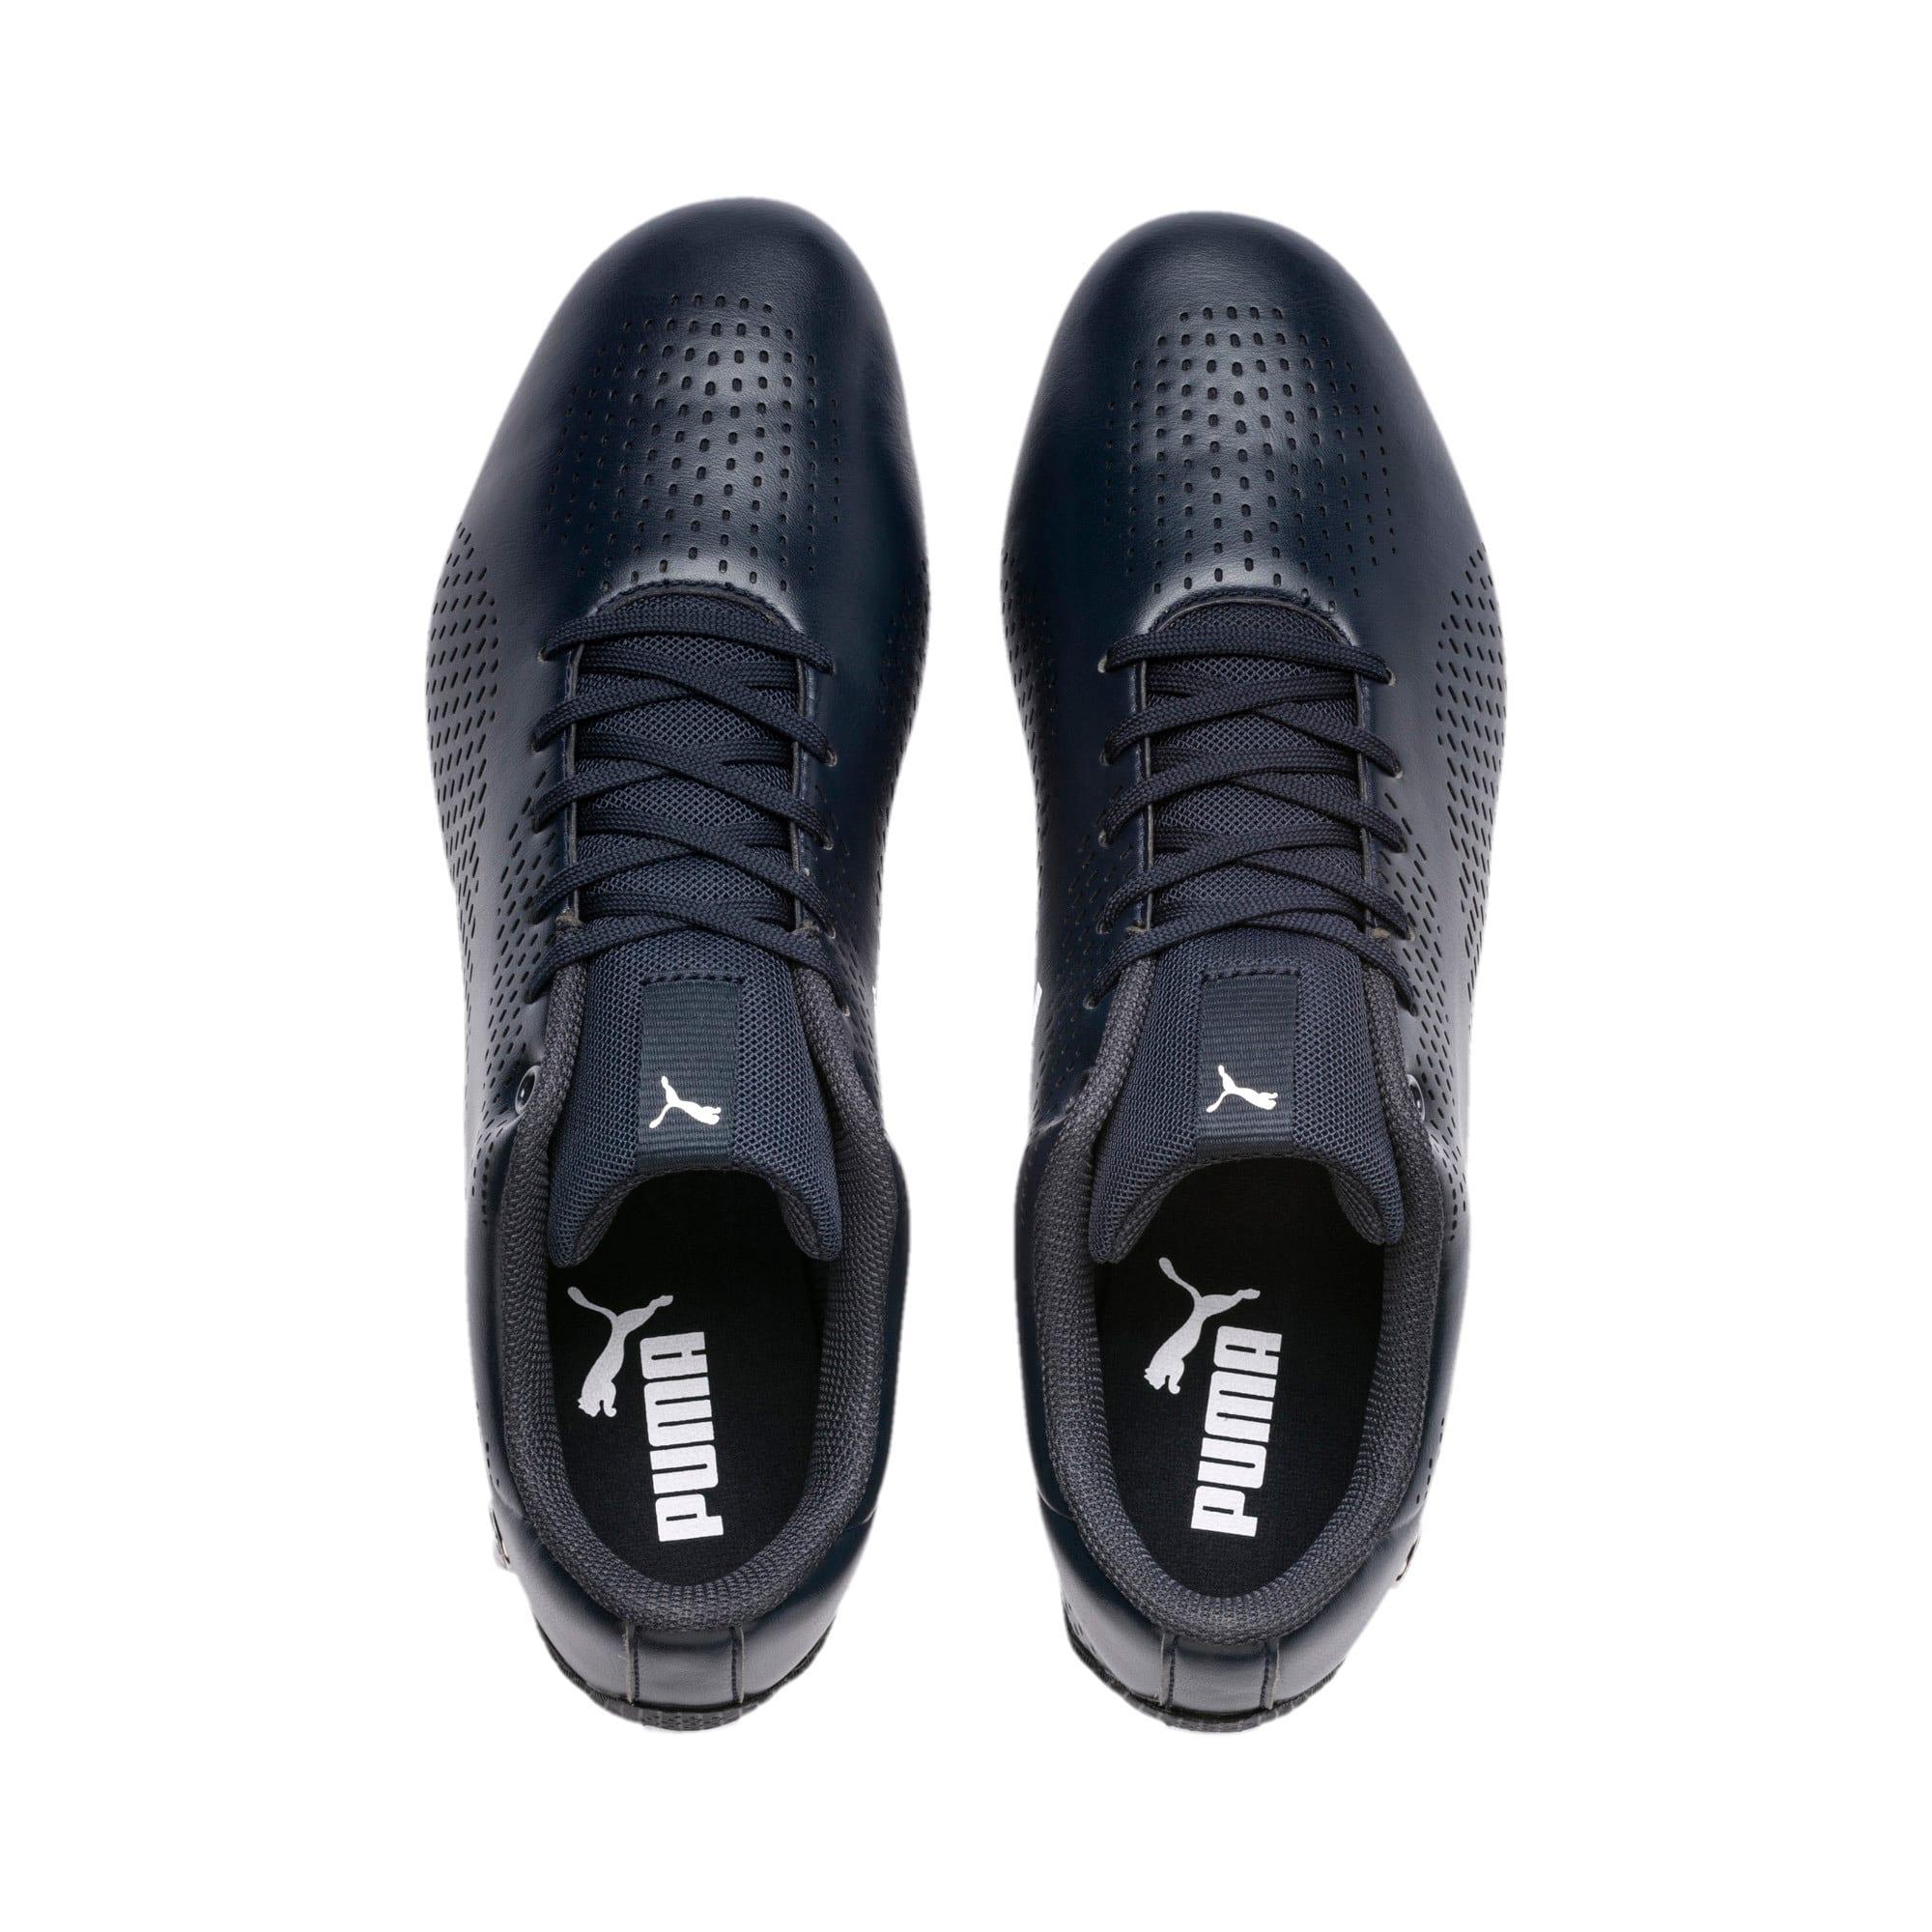 Thumbnail 6 of BMW M Motorsport Drift Cat 5 Ultra II Men's Shoes, Team Blue-Puma White, medium